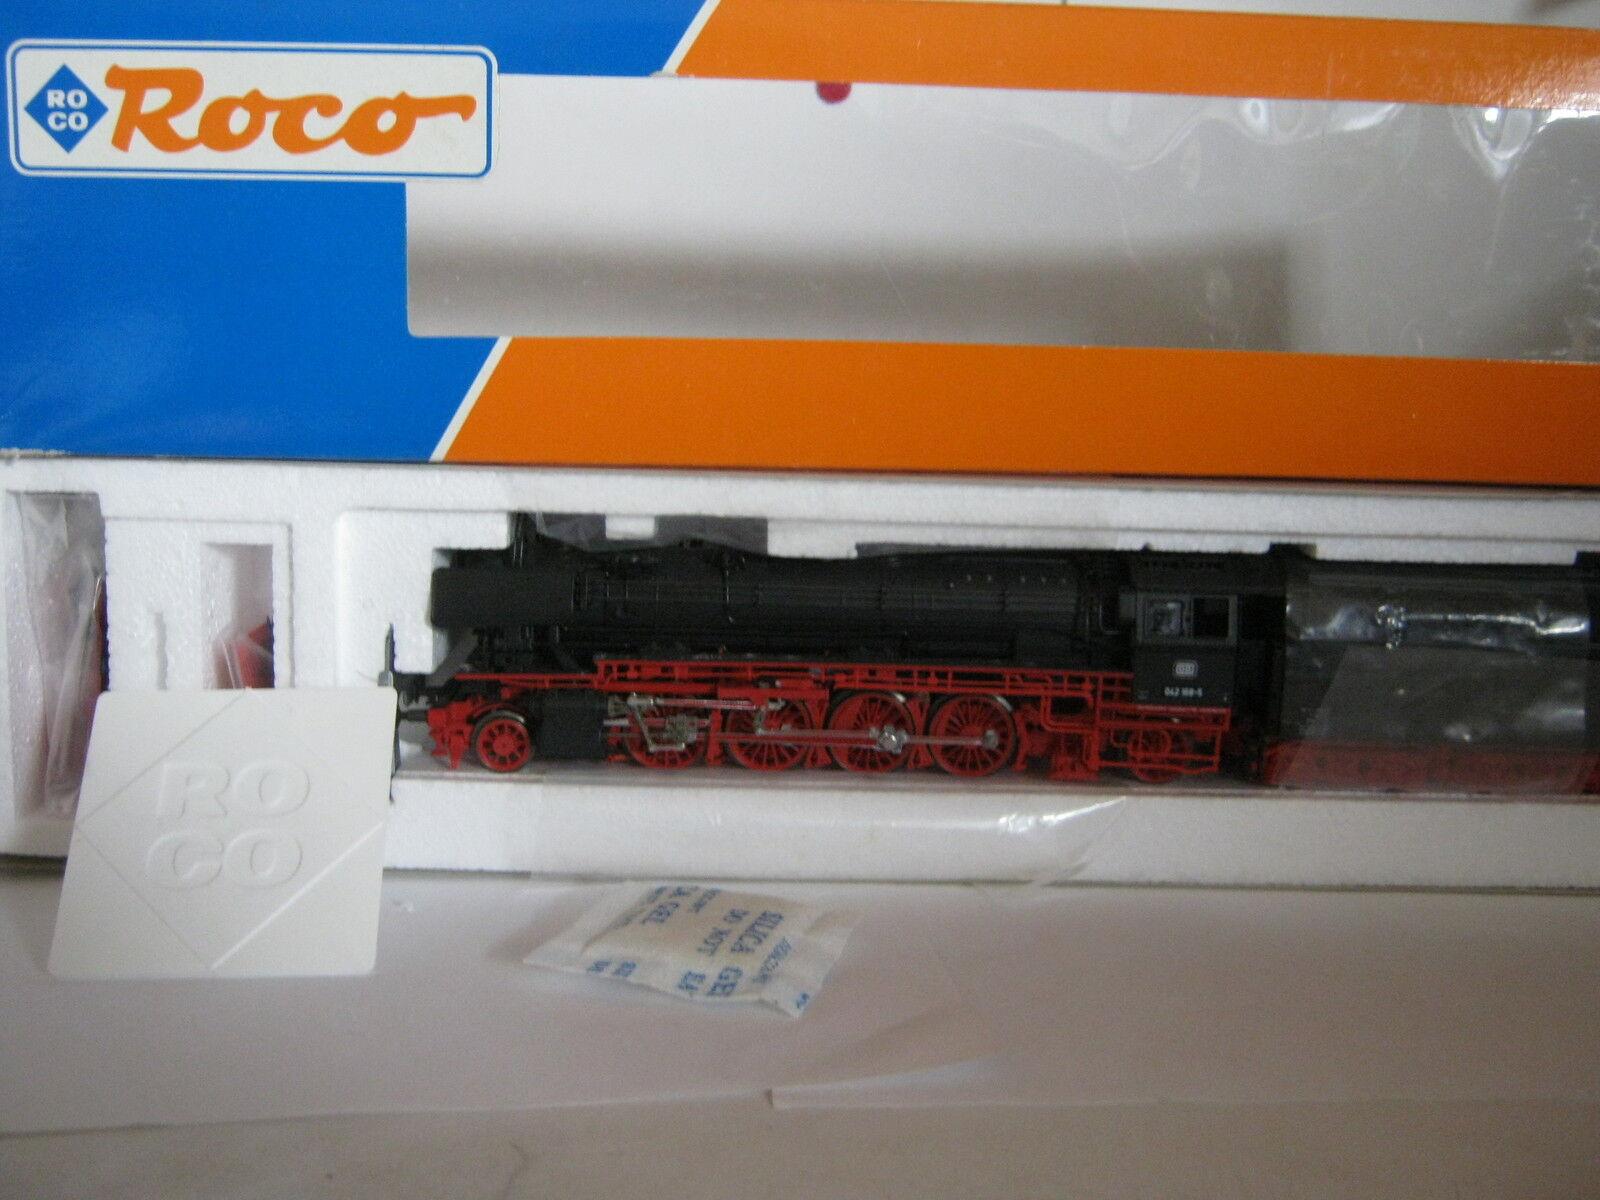 Roco ho 43244 vapor-locomotora btrnr 042 168-5 DB (rg bb 111s1)